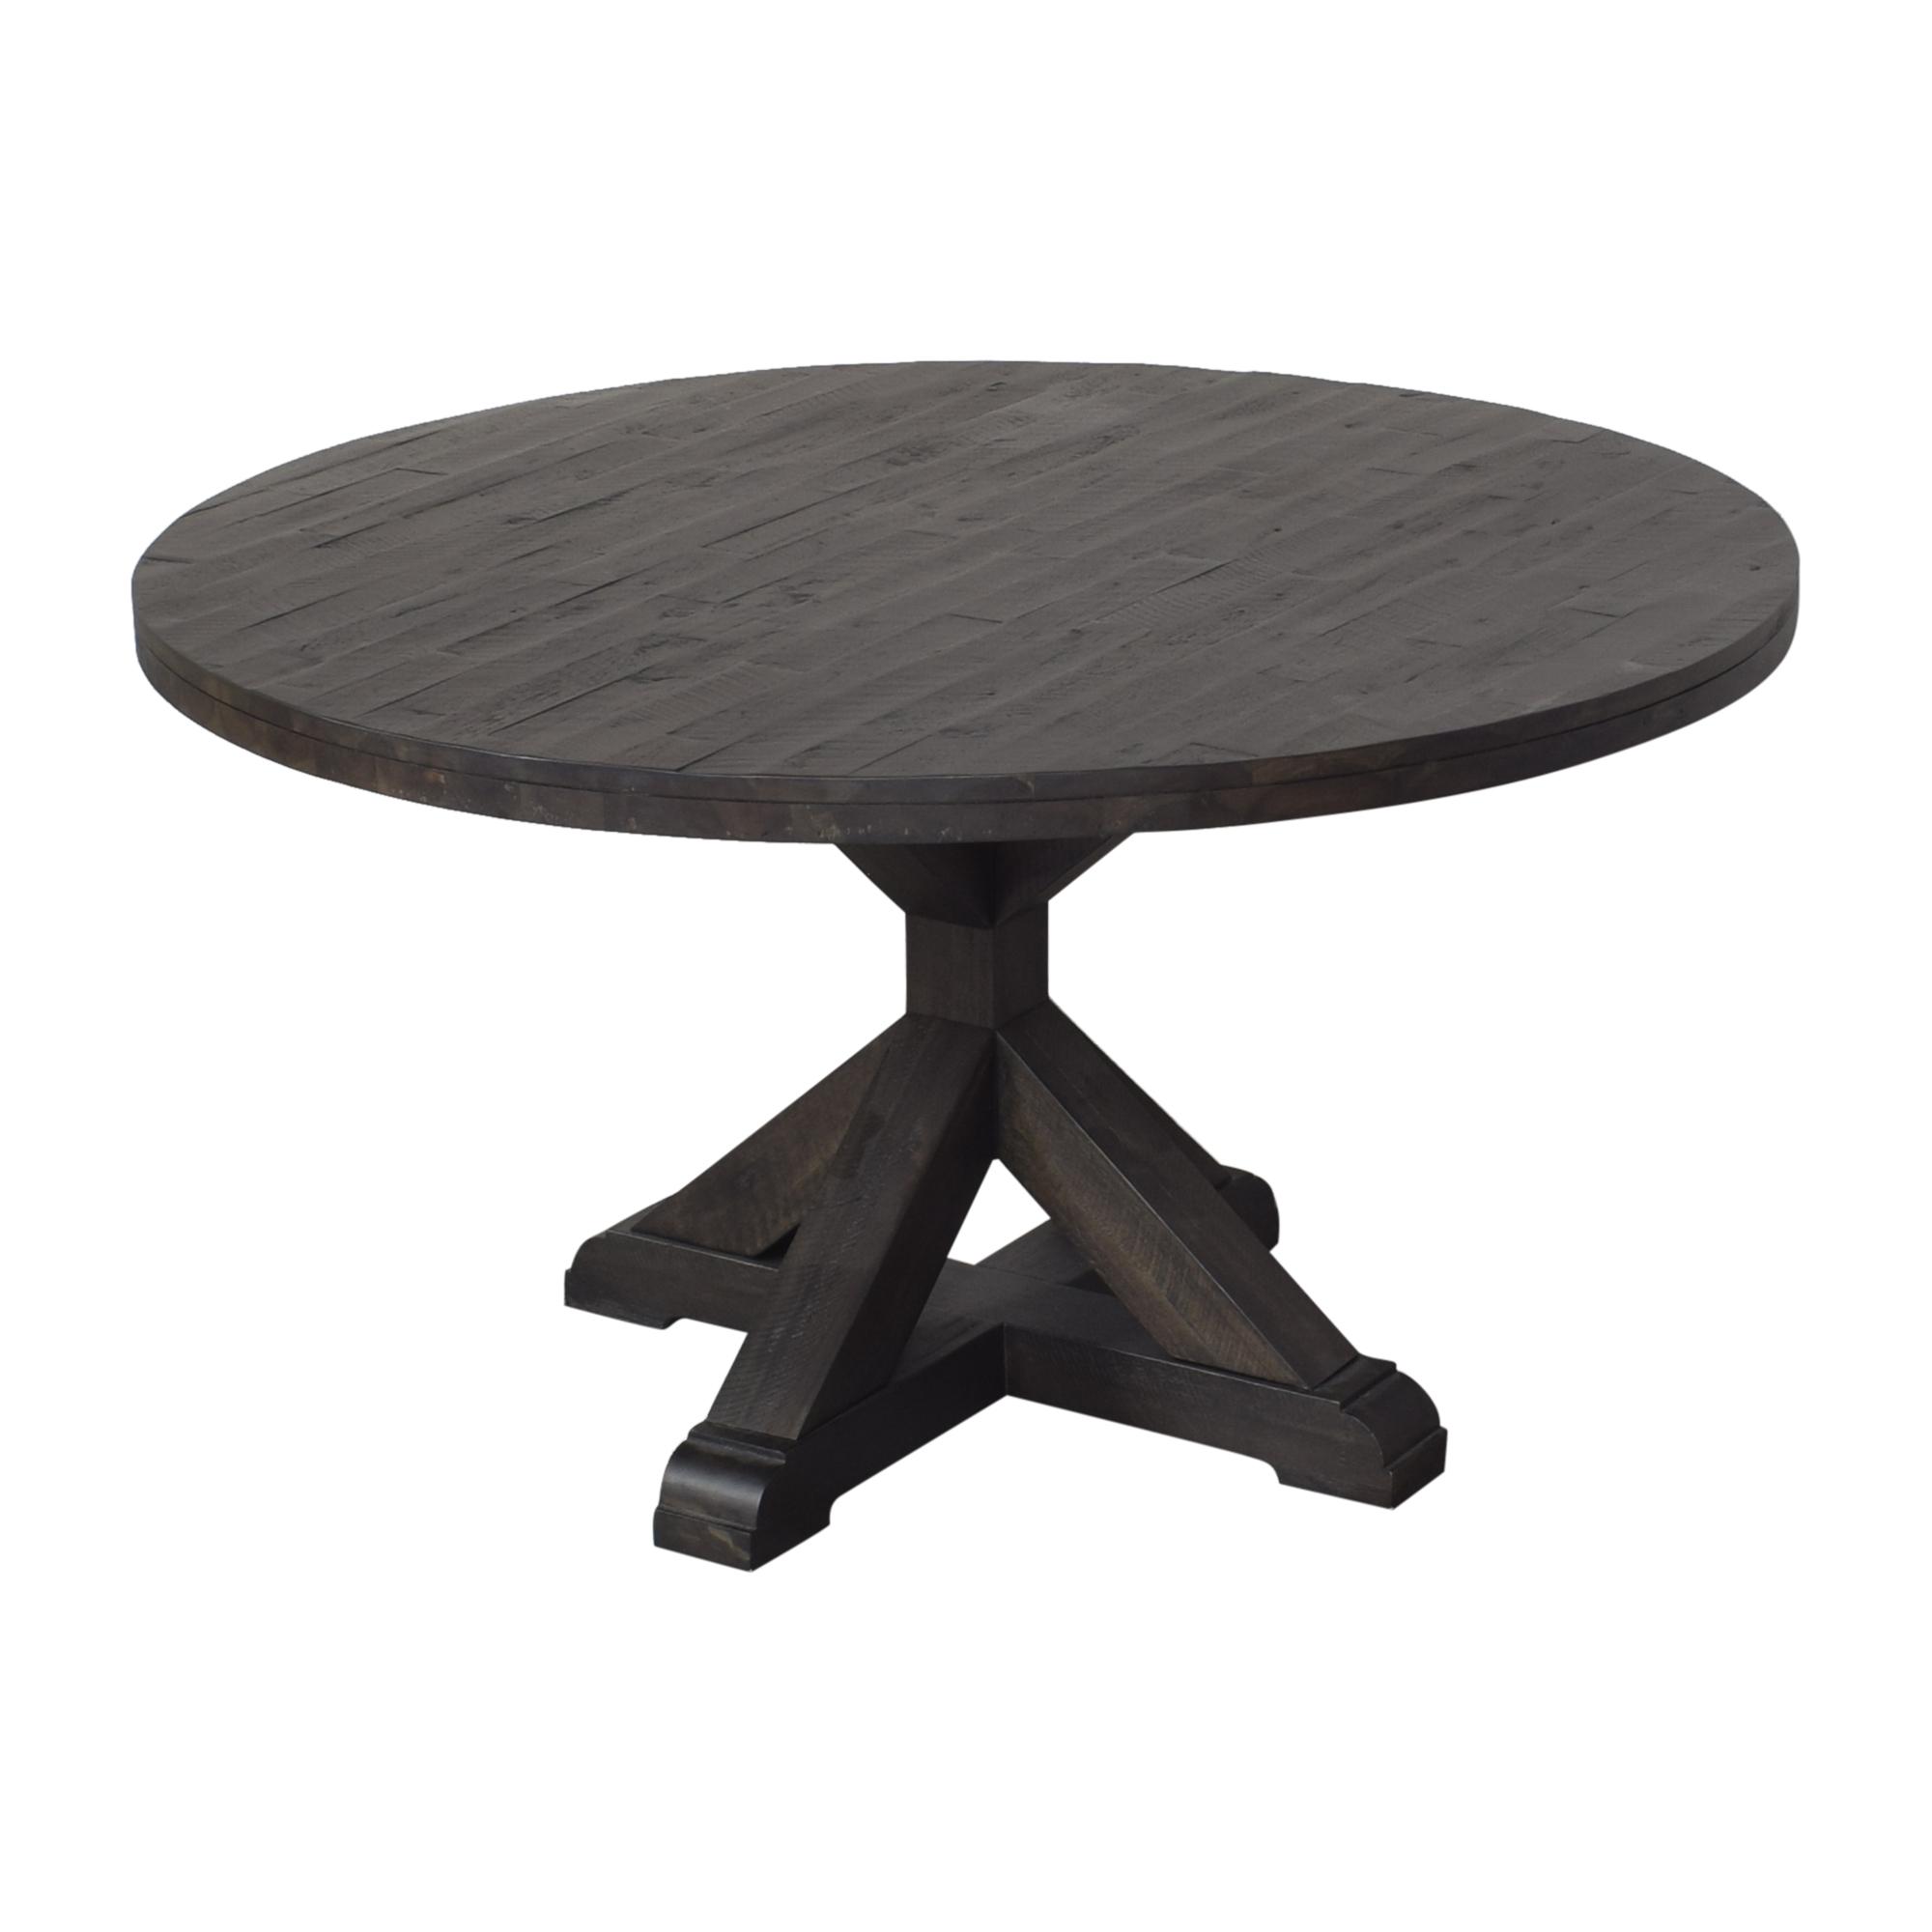 Wayfair Wayfair Birch Lane Fahey Pedestal Dining Table used